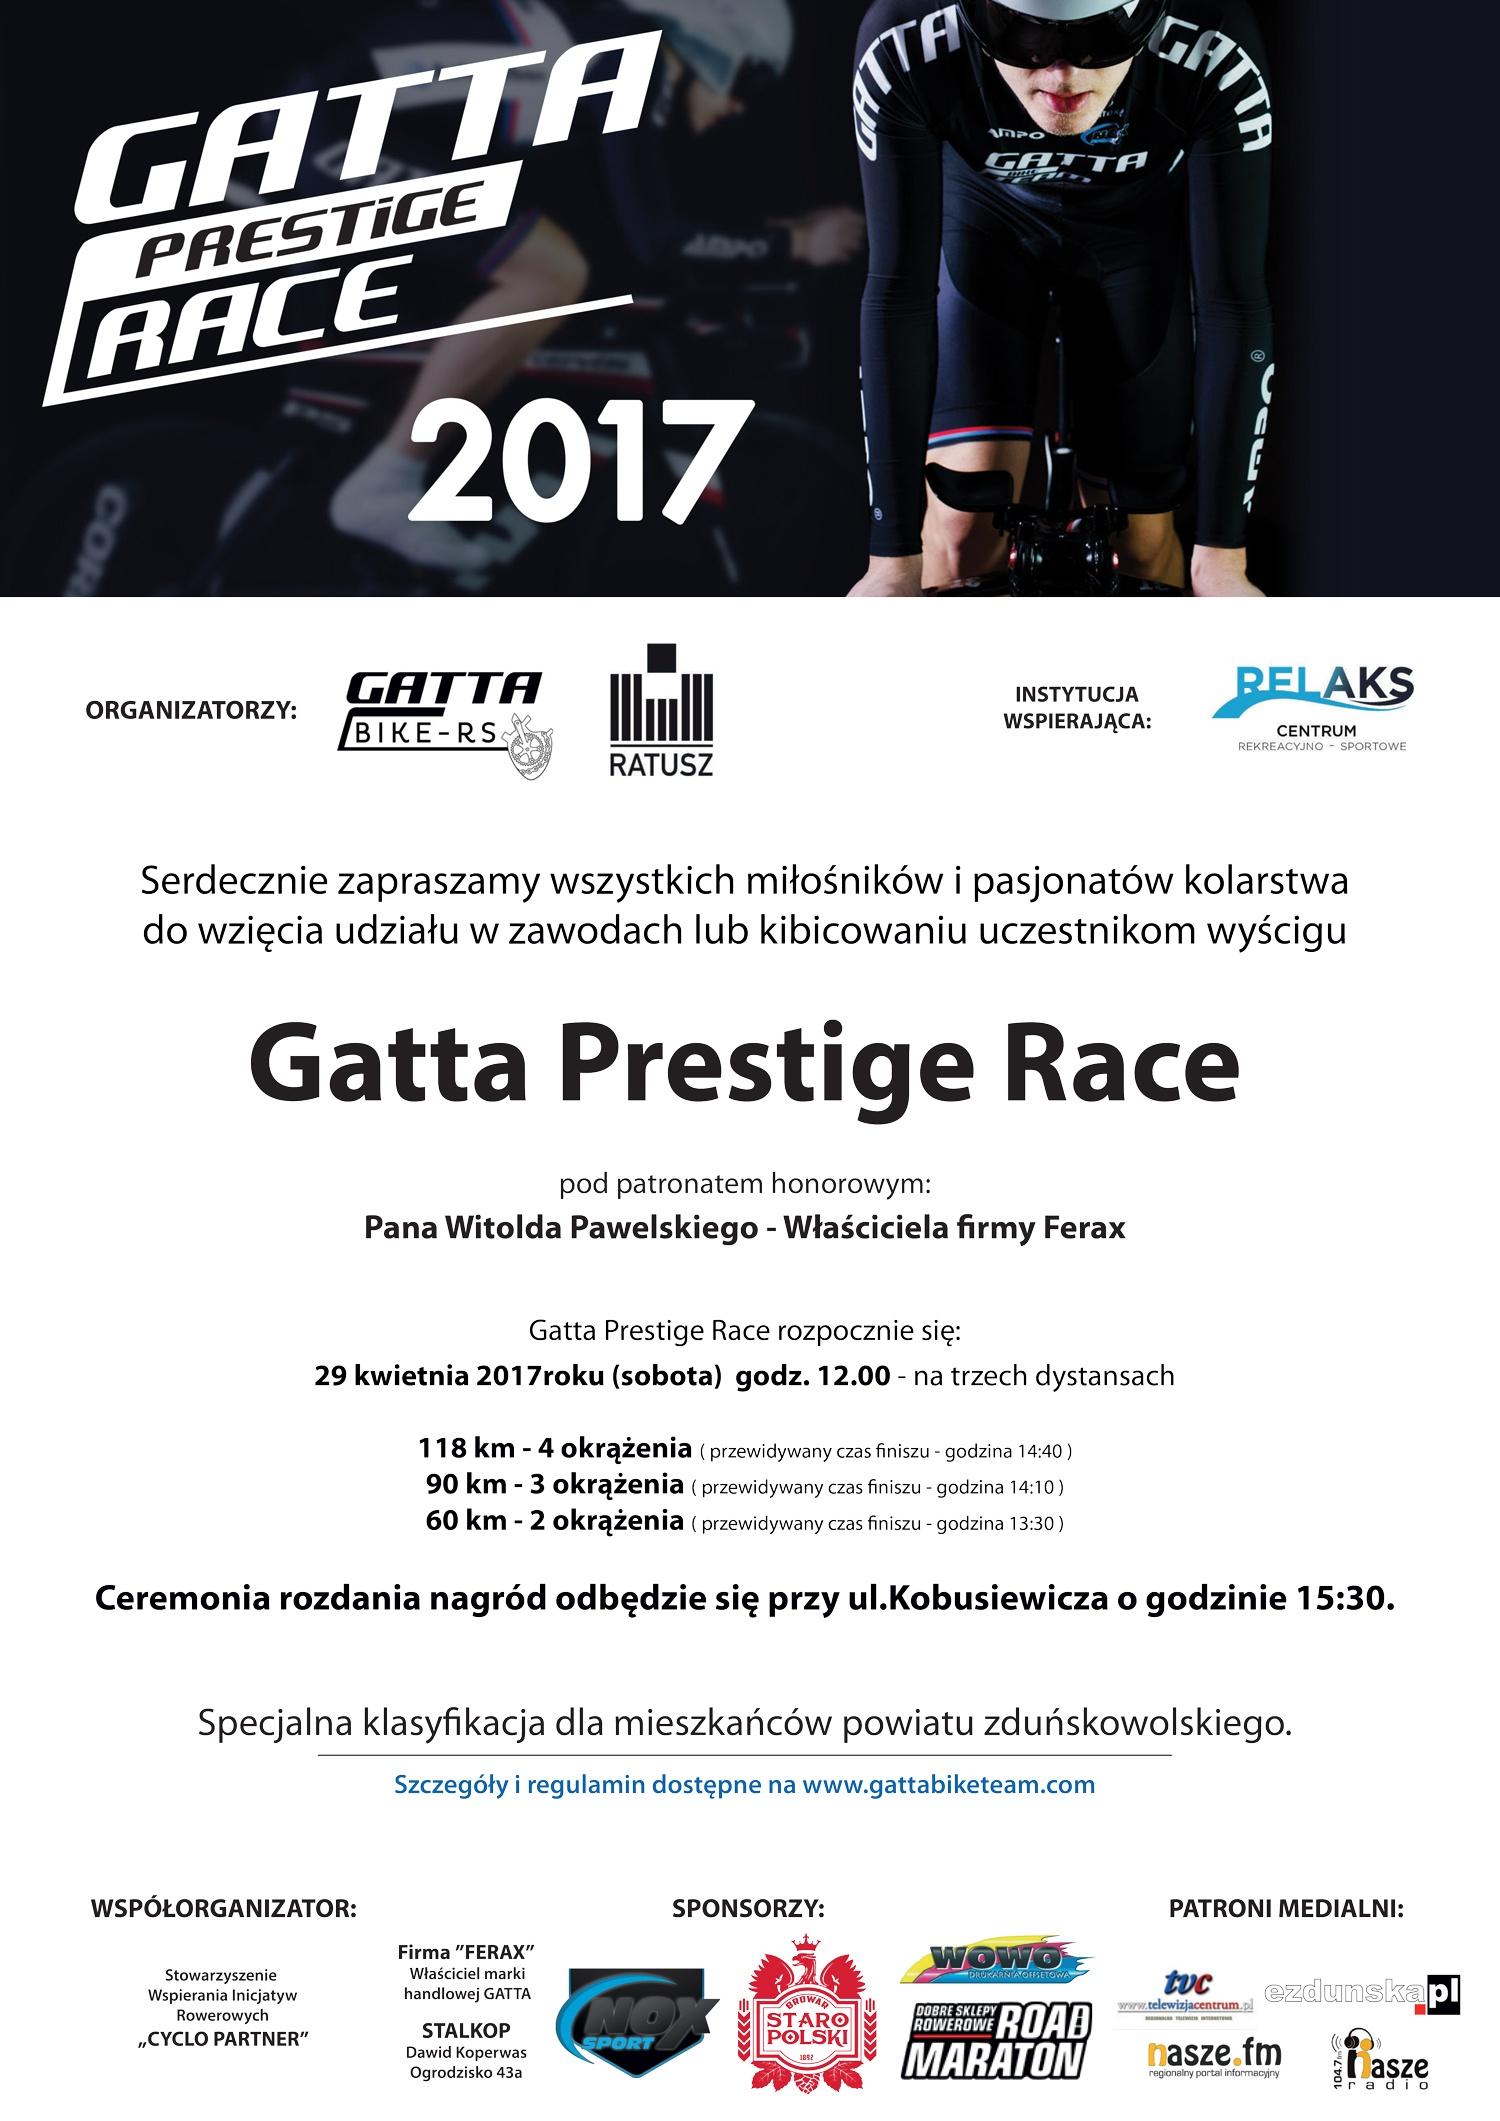 plakat_gatta_prestige_race_2121